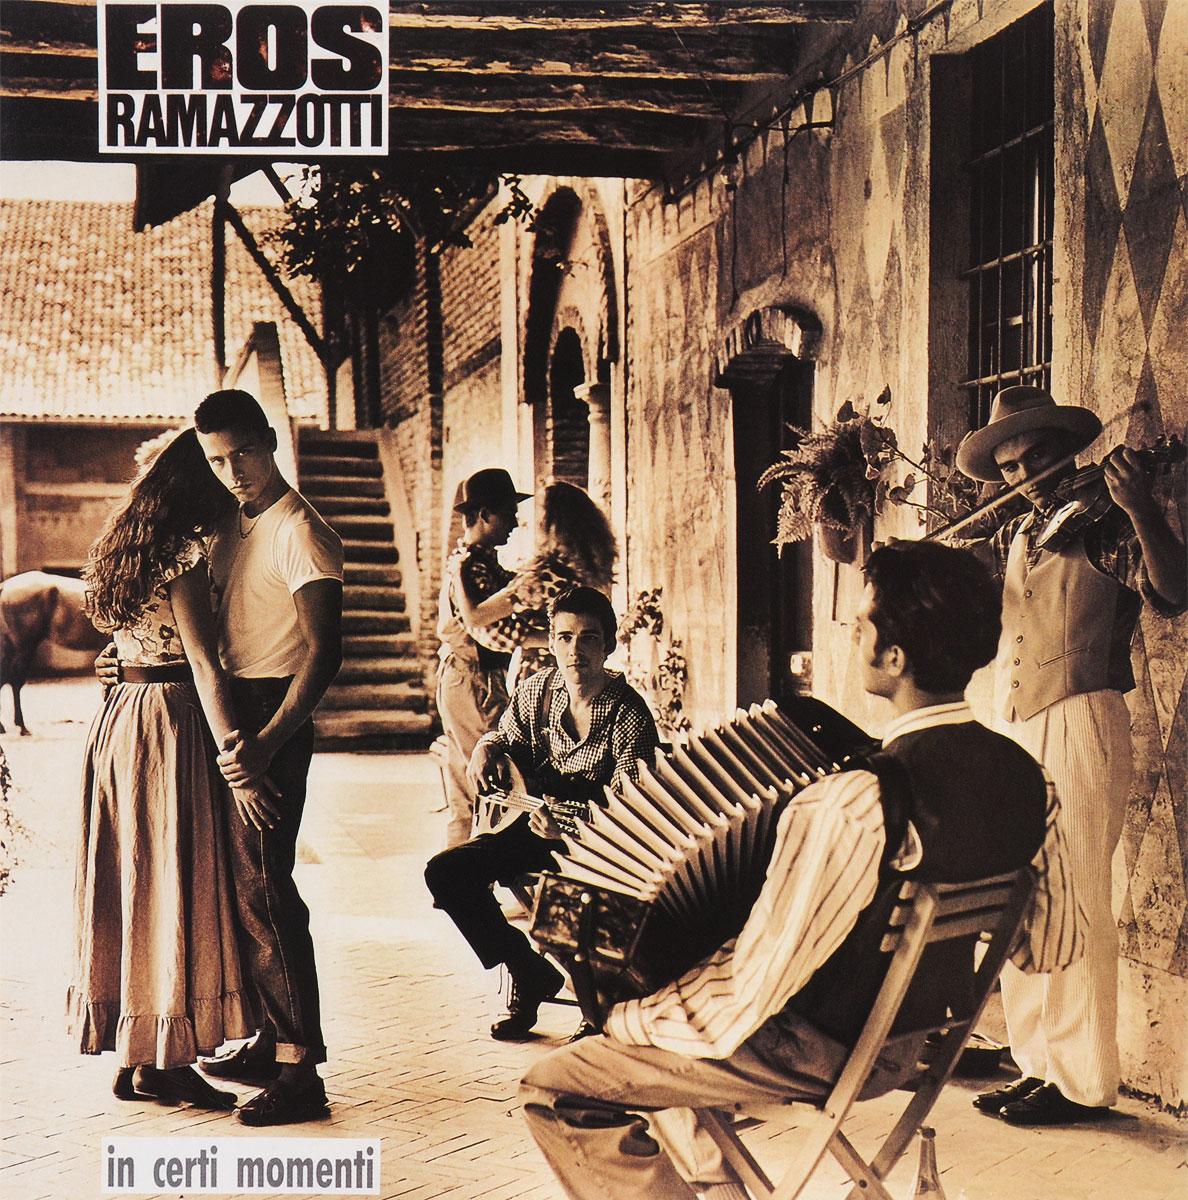 Эрос Рамазотти Eros Ramazzotti. In Certi Momenti (LP) эрос рамазотти eros ramazzotti e2 2 cd